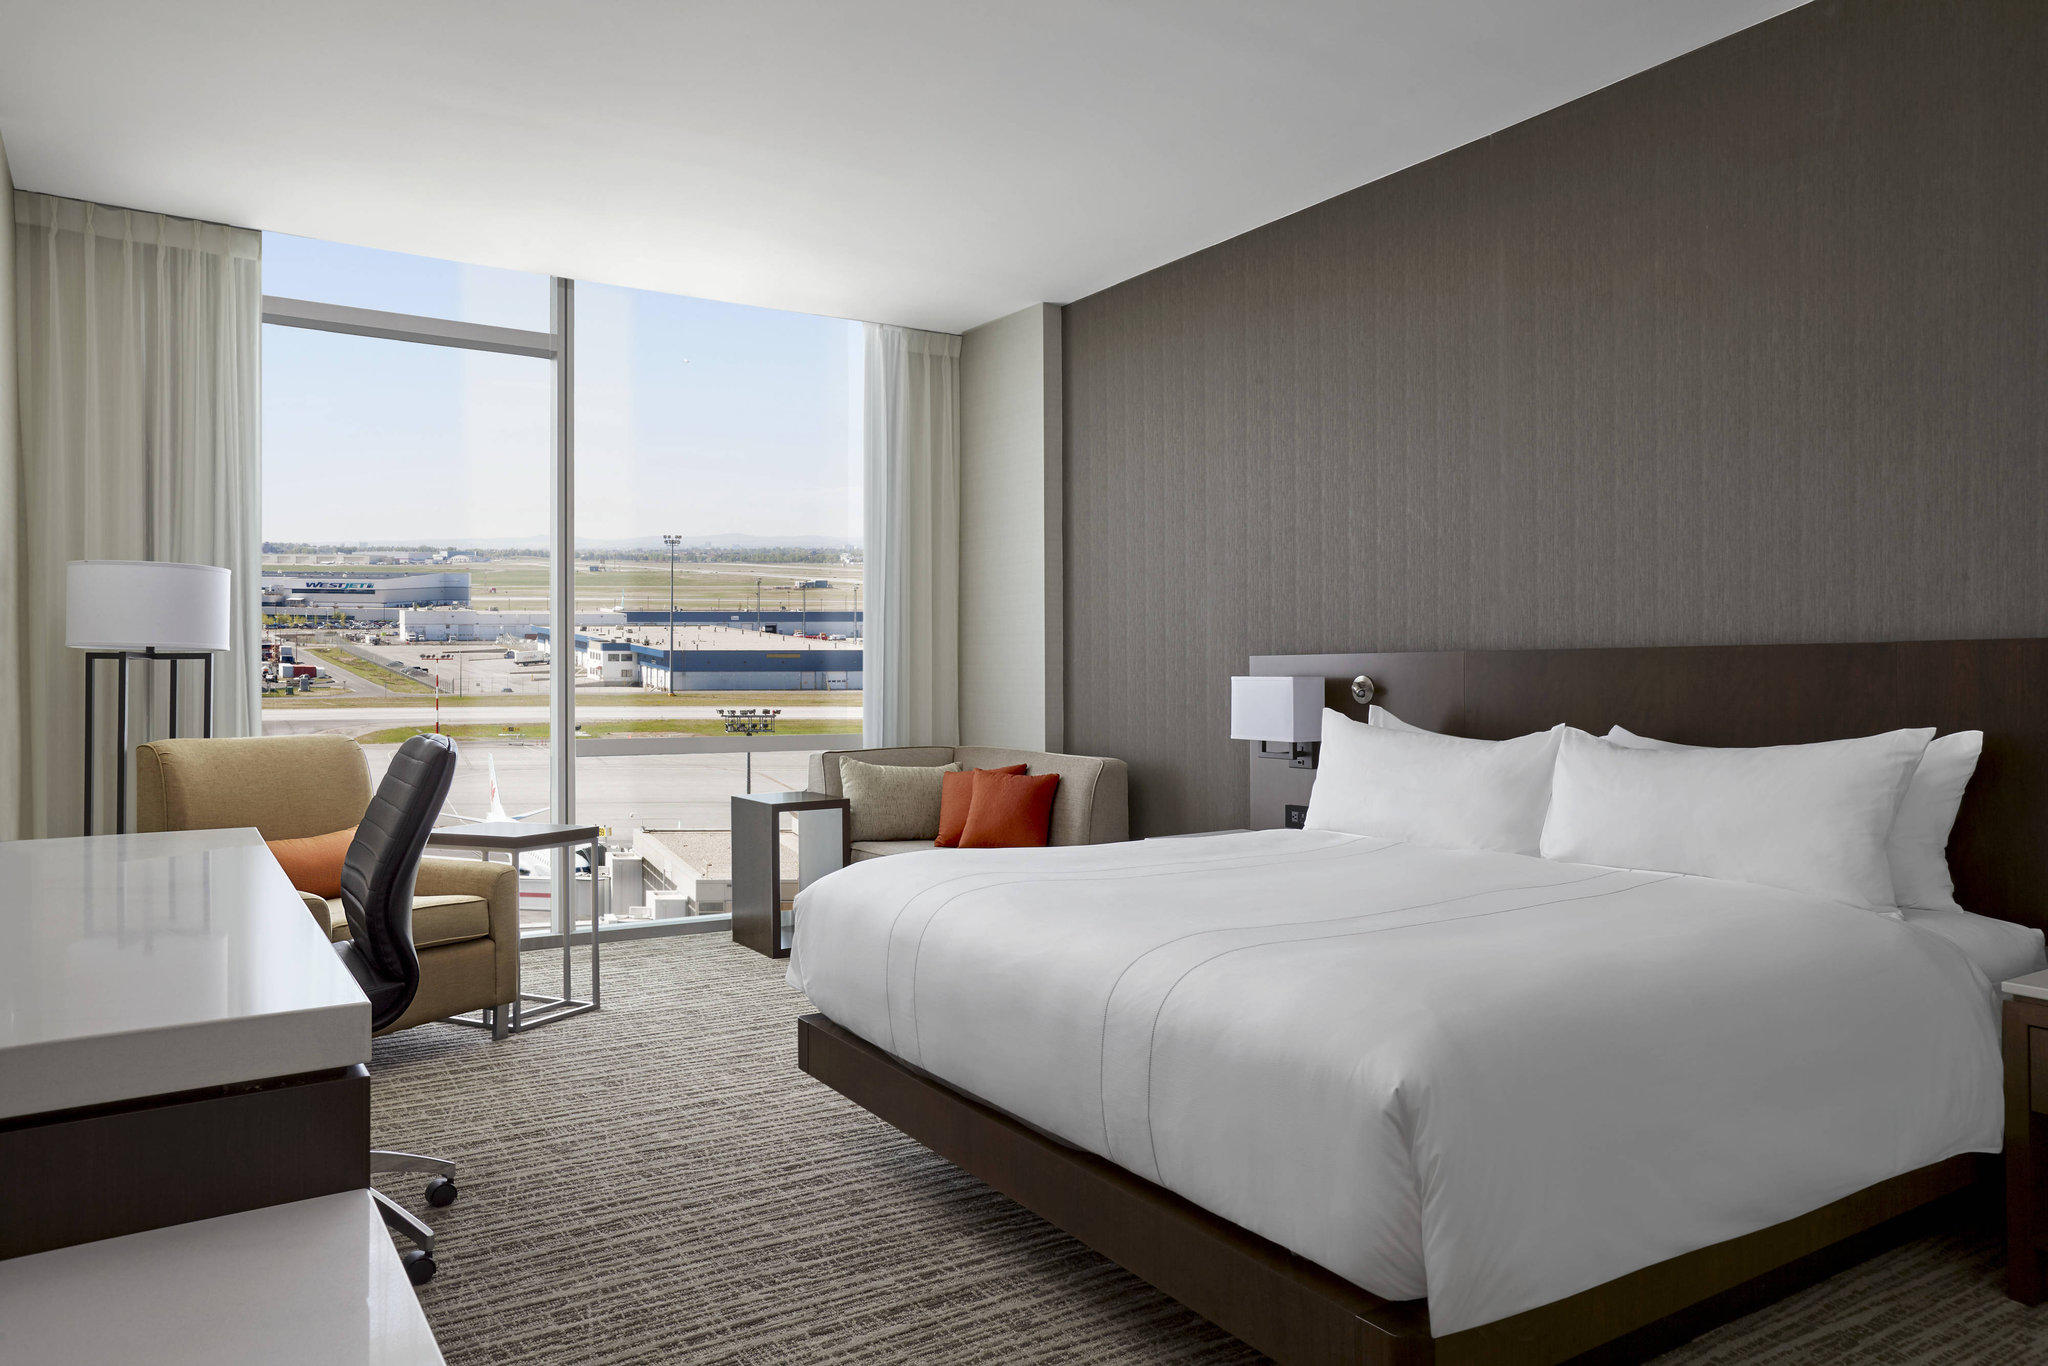 Calgary Airport Marriott In-Terminal Hotel